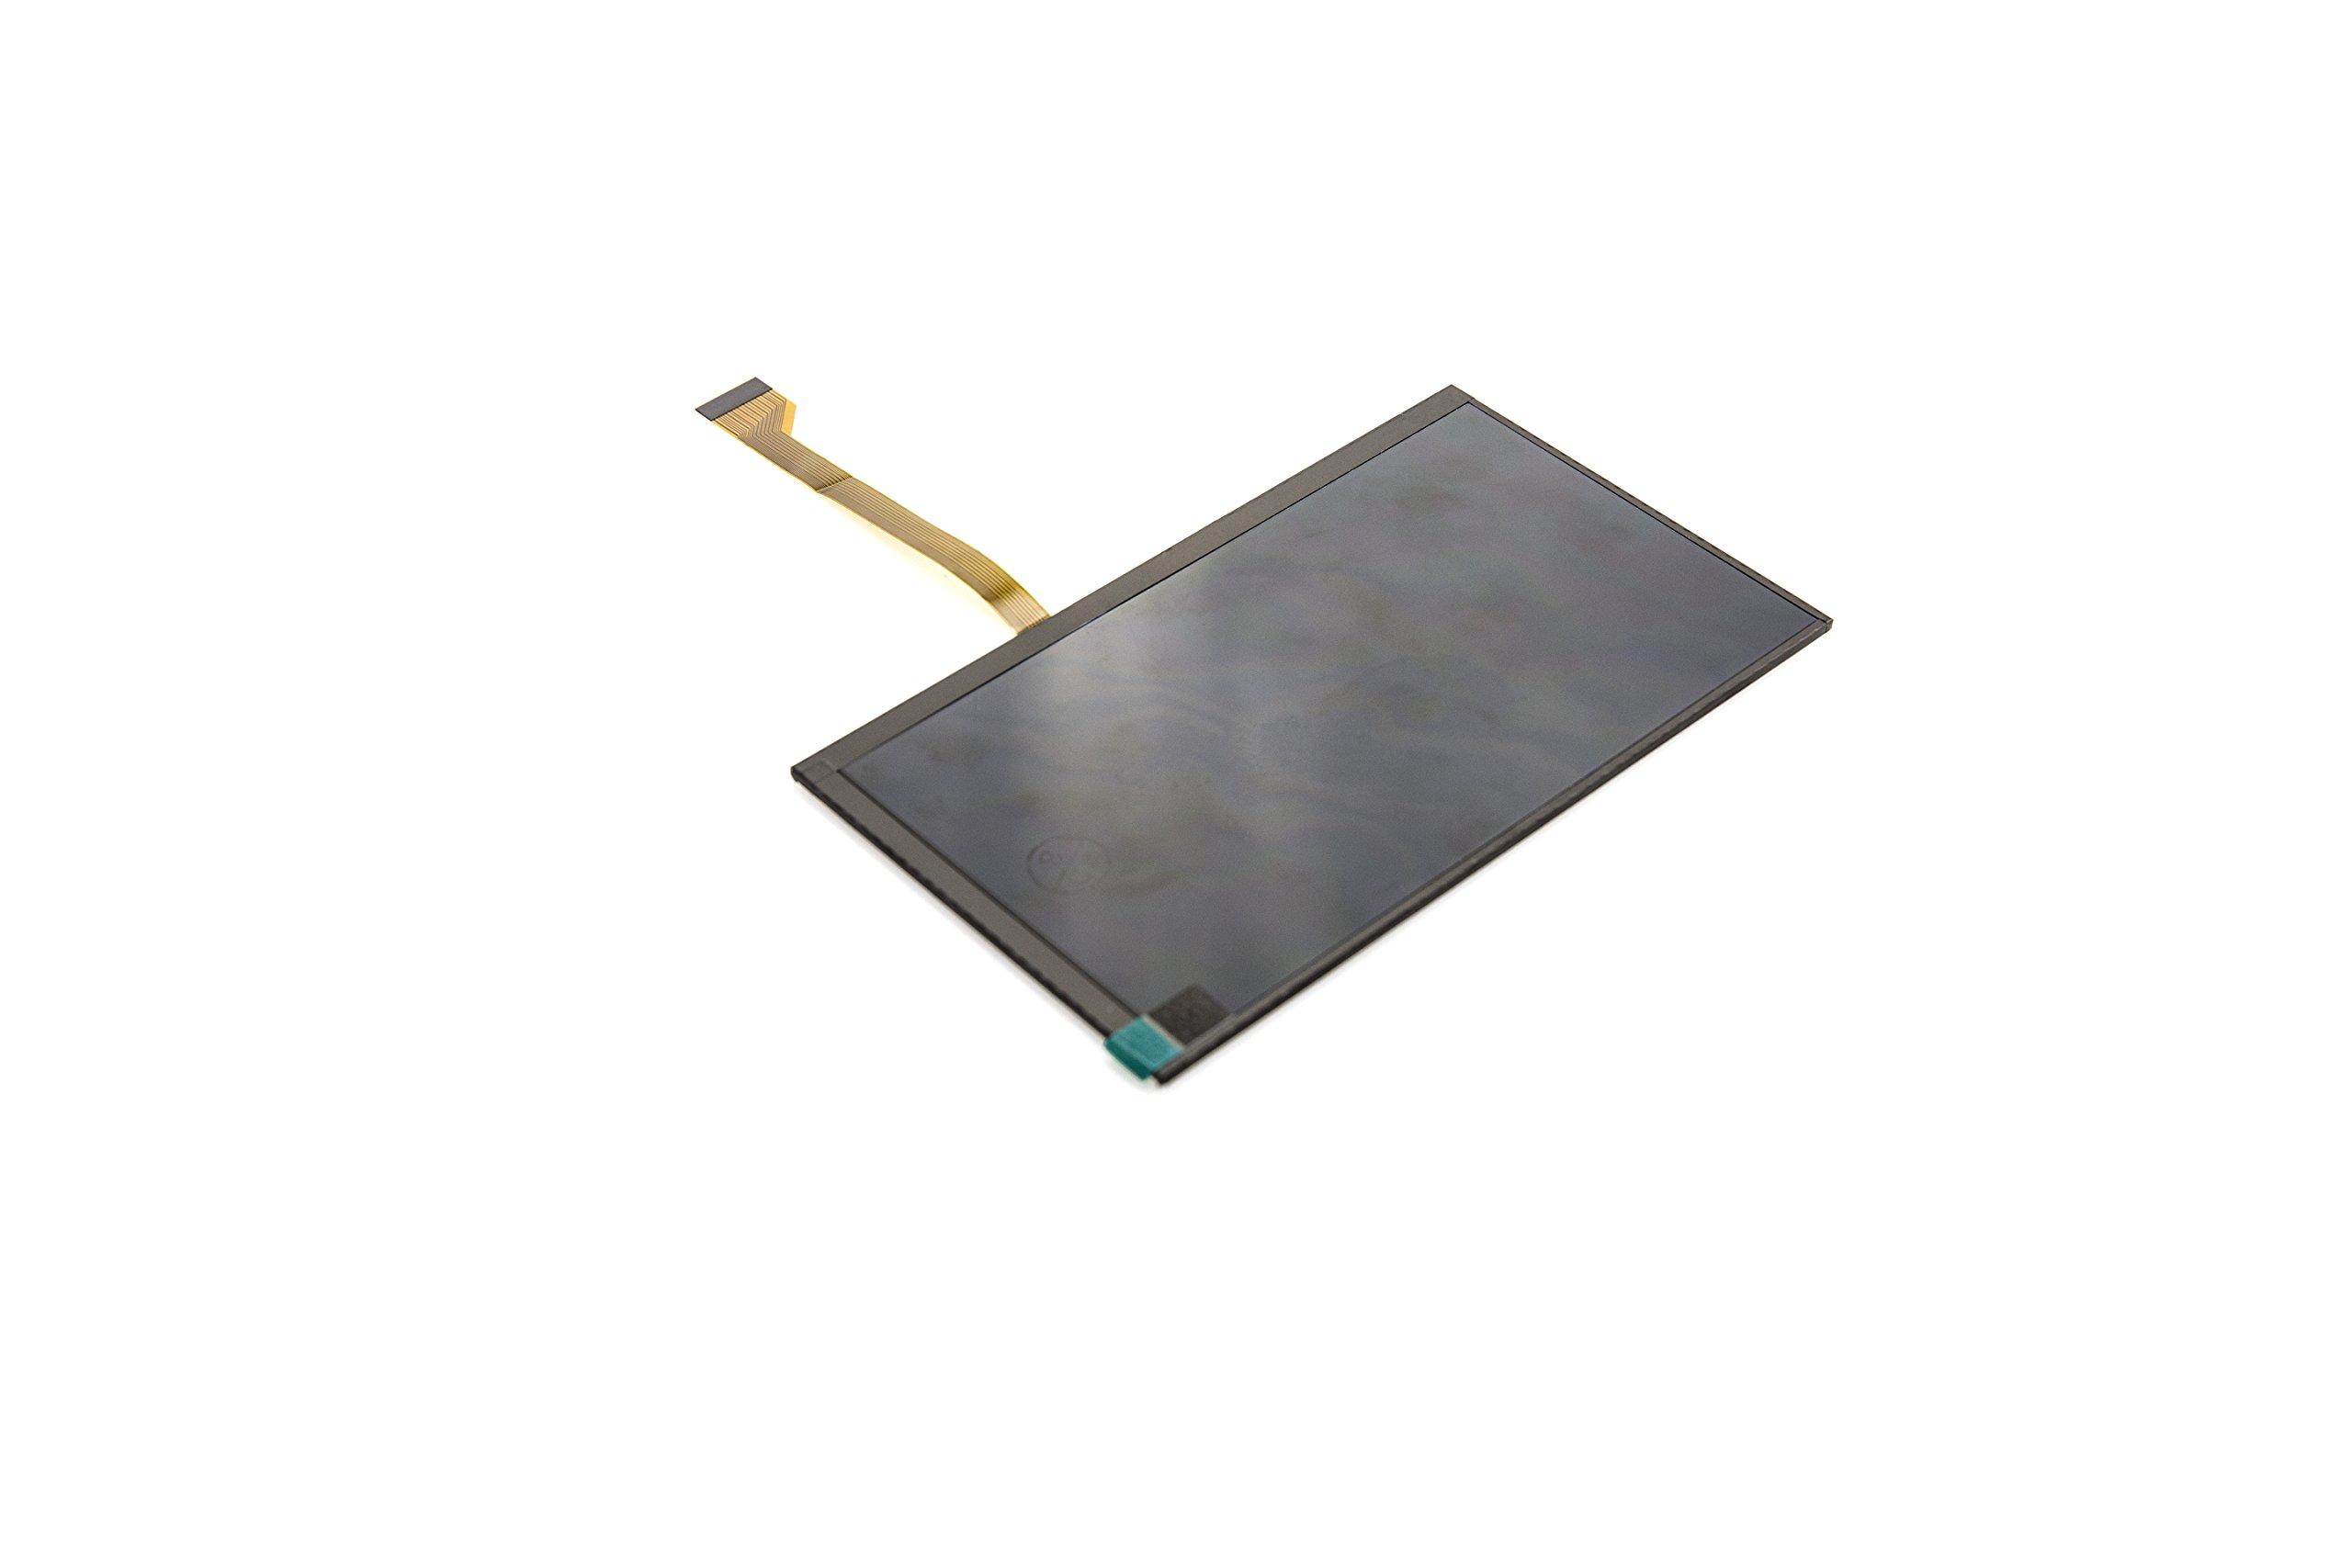 LattePanda 7-inch 1024x600 IPS Display for